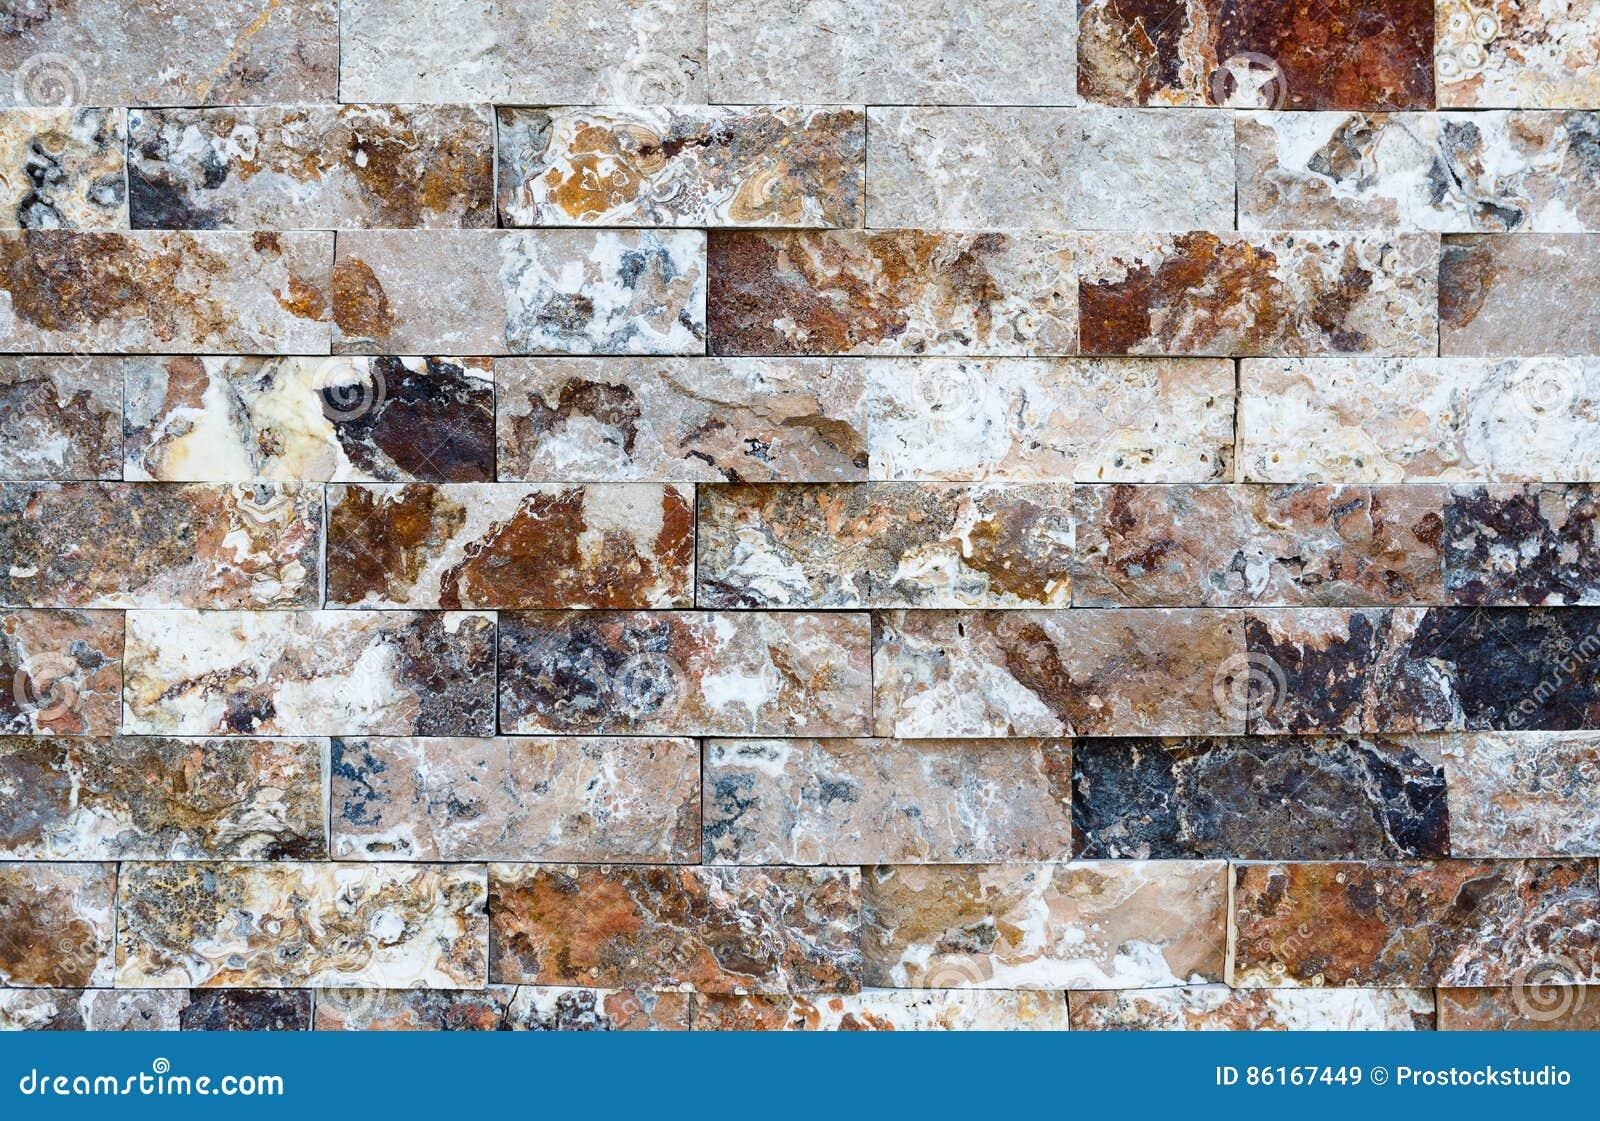 Decorative Brick Walls : Pattern of marble stone decorative brick wall texture and